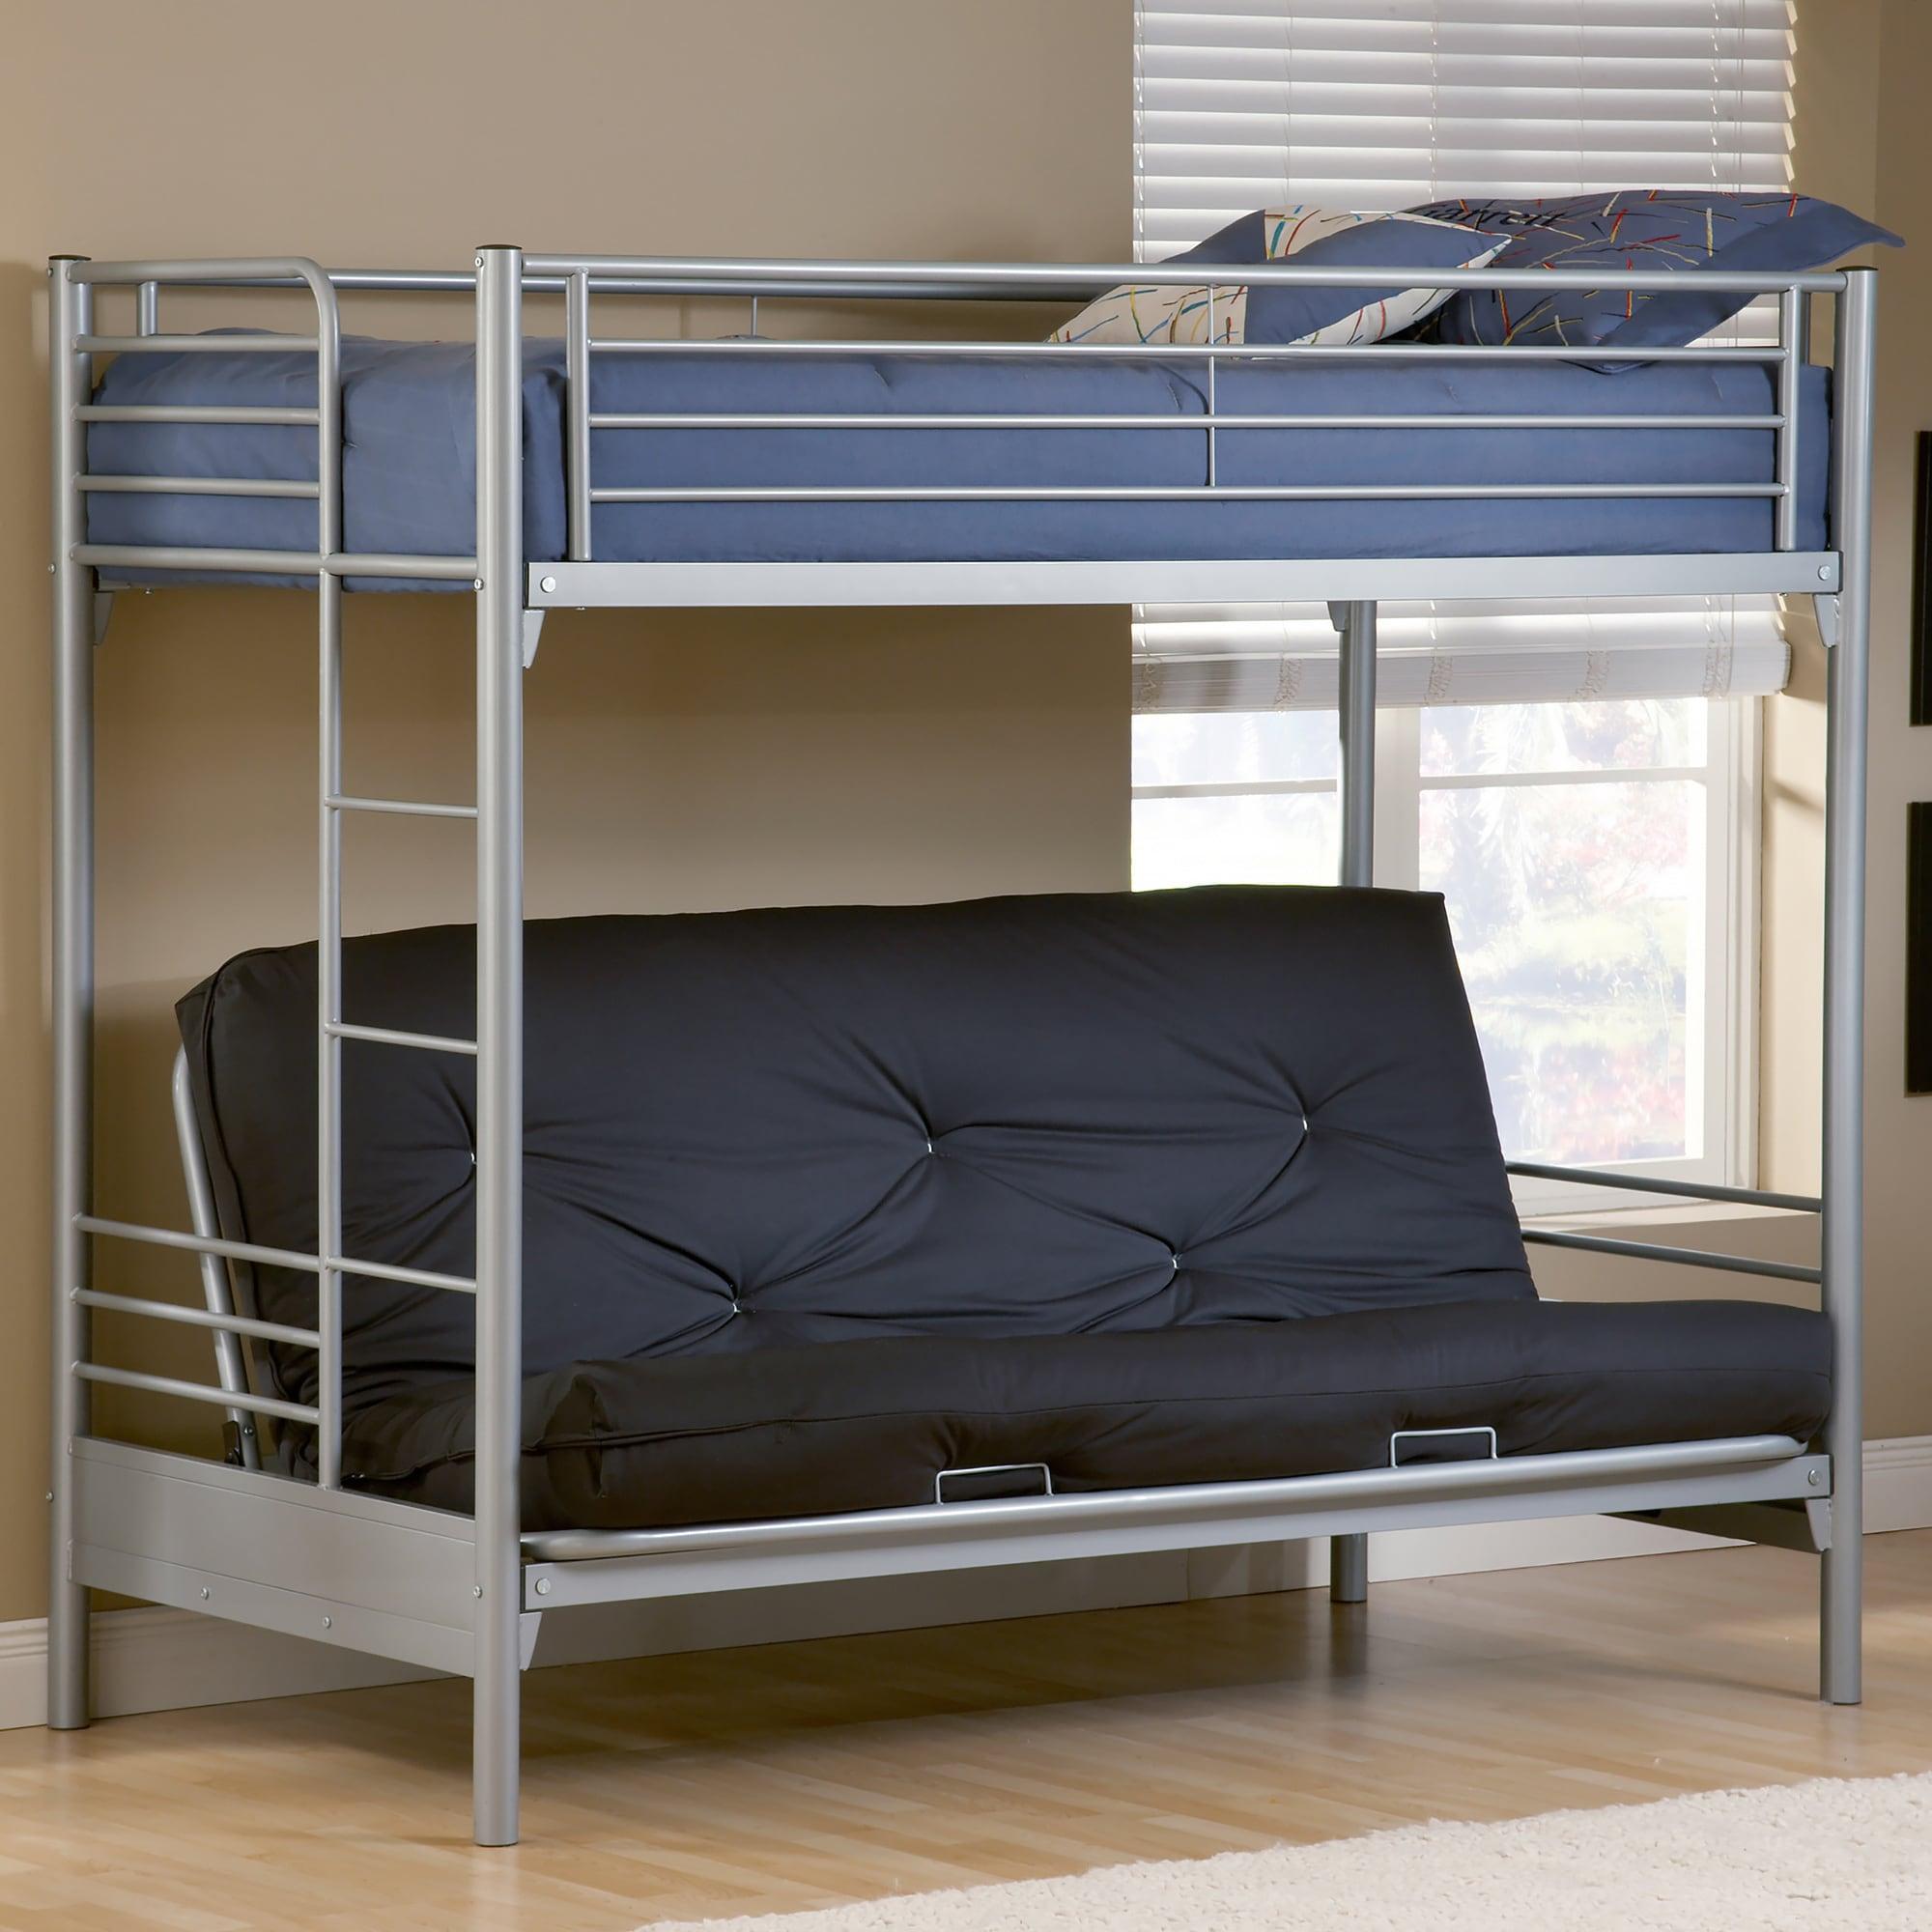 Hillsdale Brayden Twin-over-Full Futon Bunk Bed (Silver)